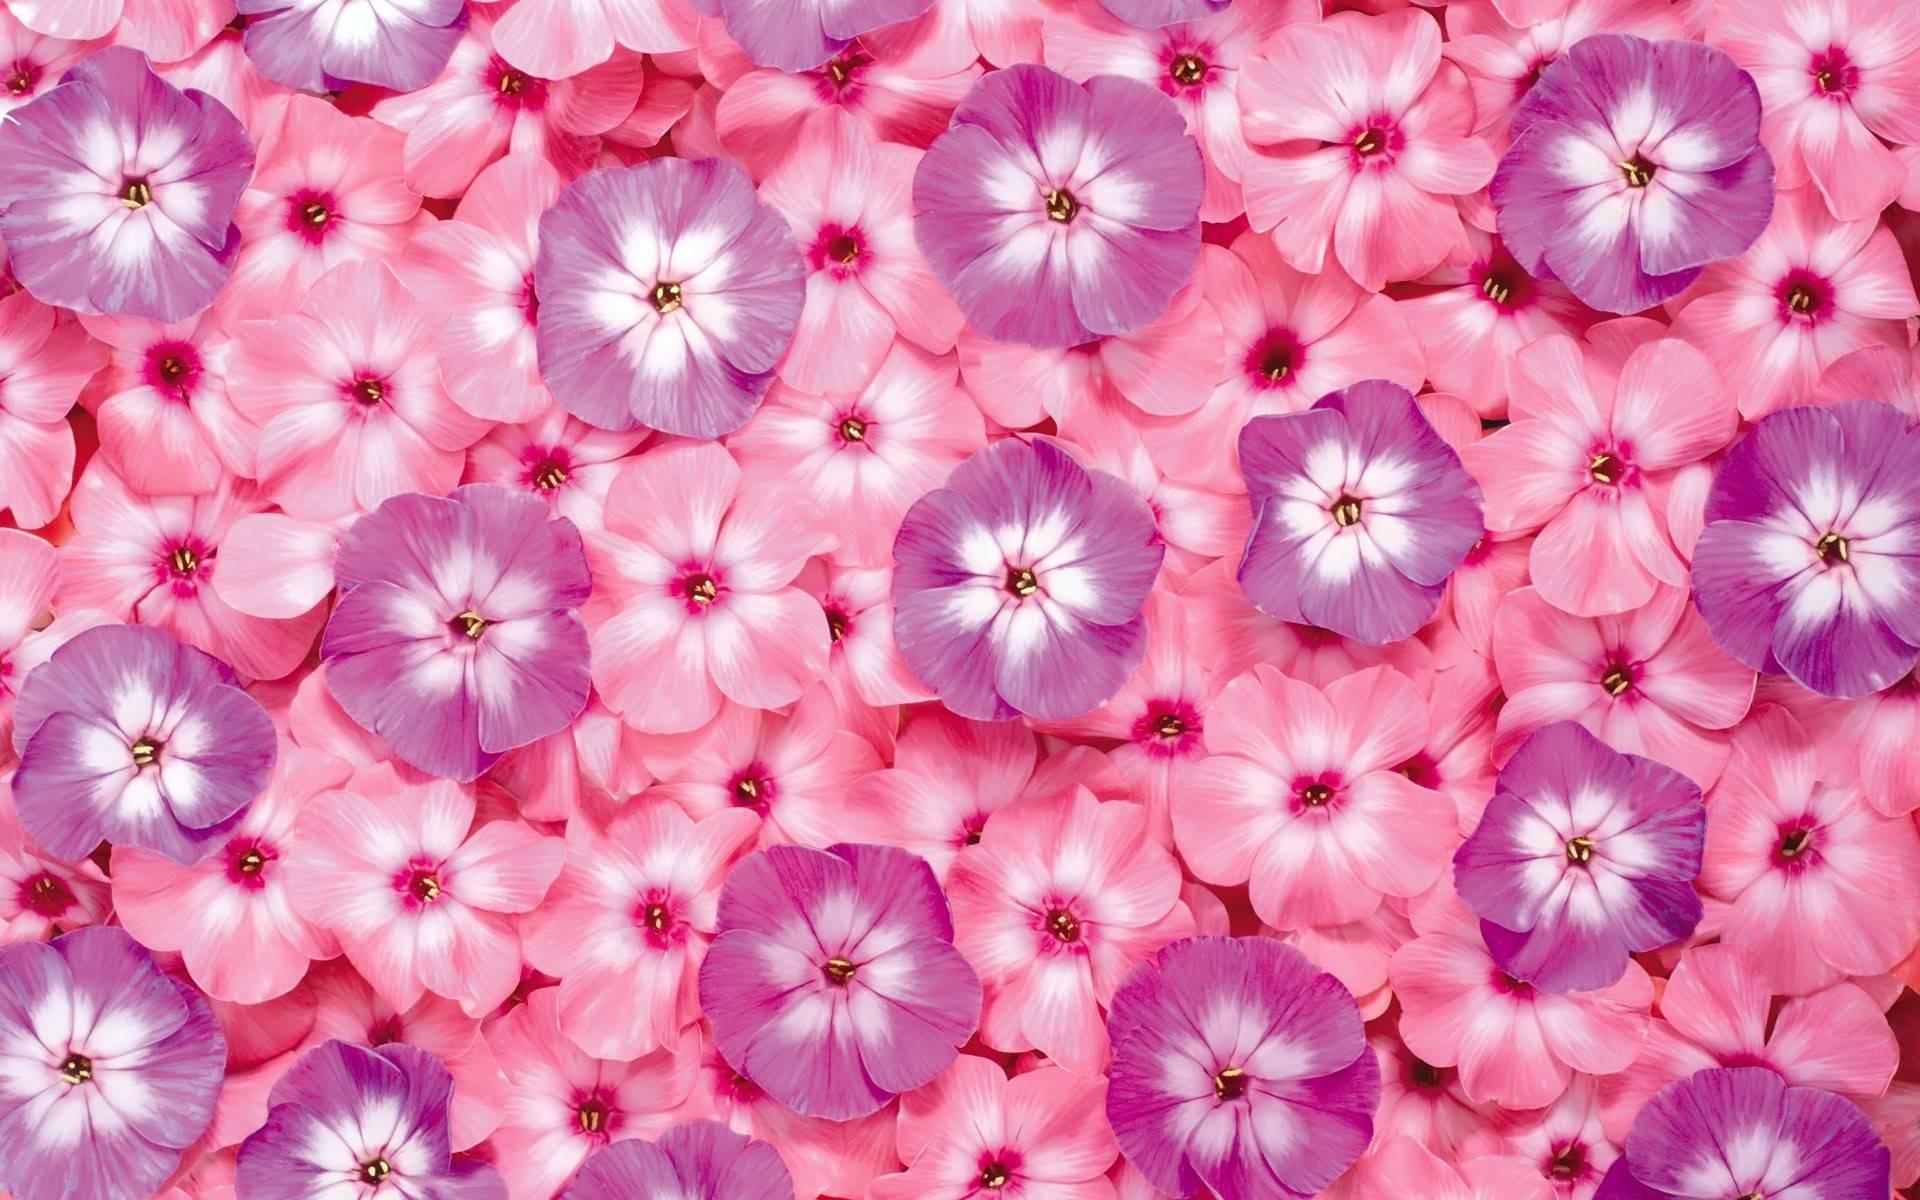 Фото на весь экран цветов